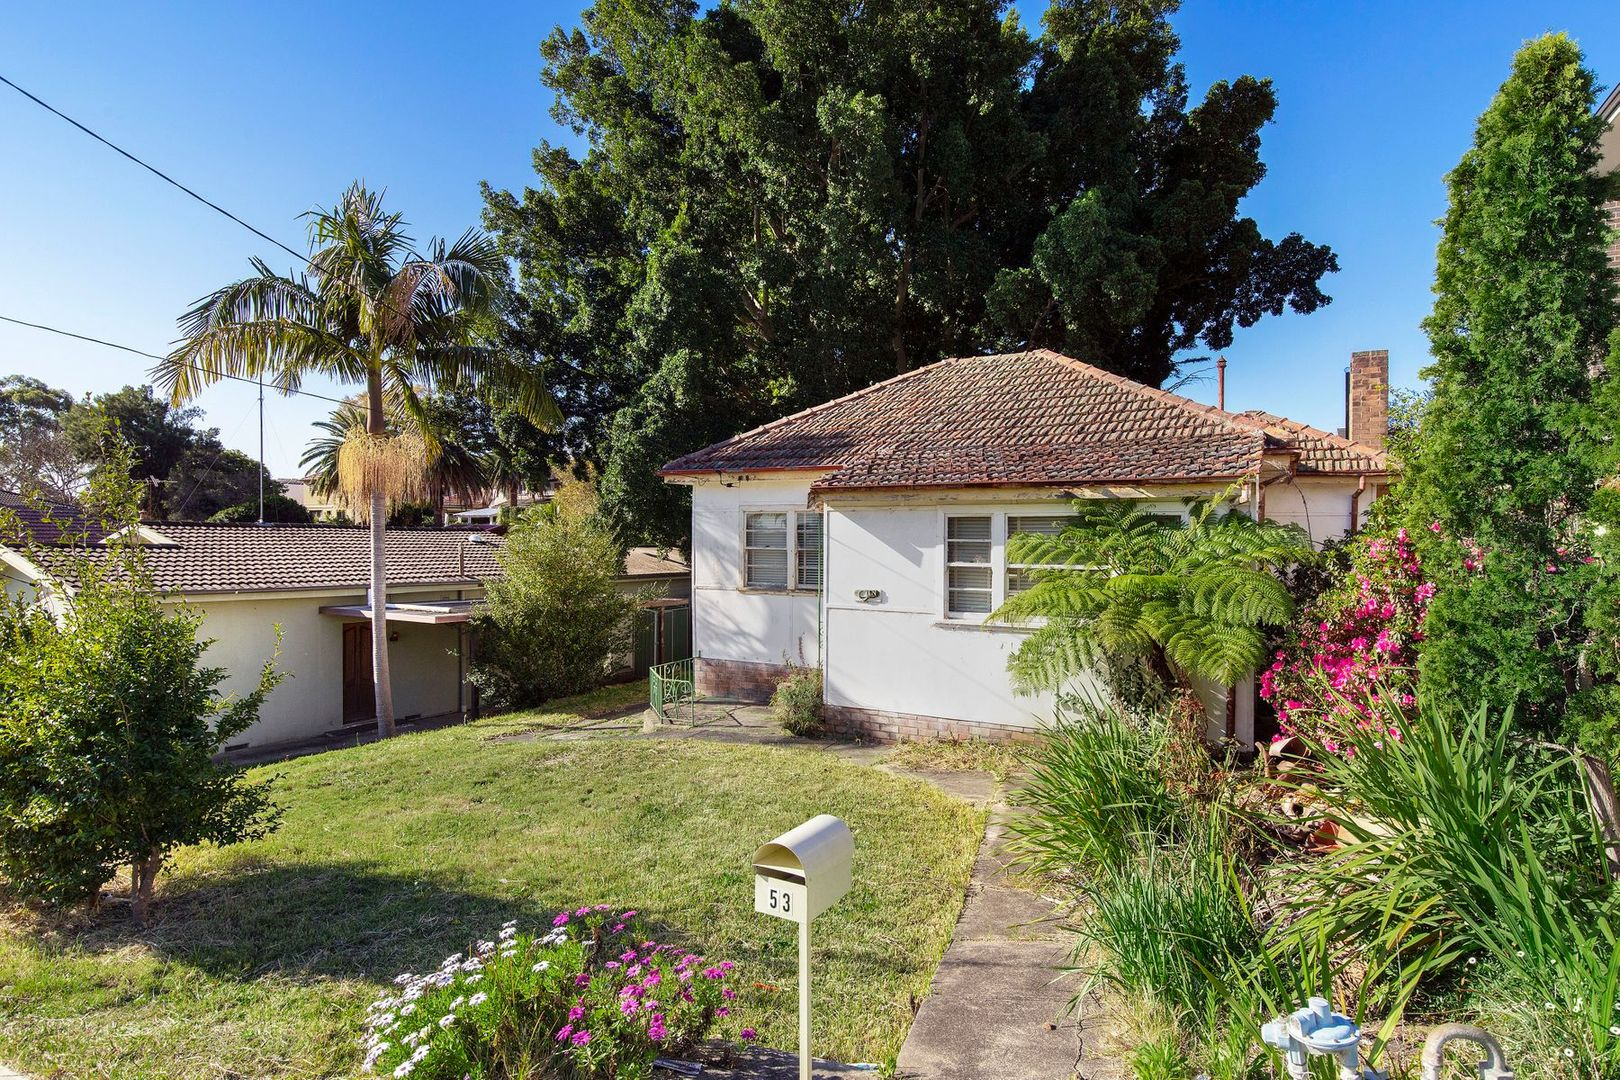 53 Morrison Road, Gladesville NSW 2111, Image 0